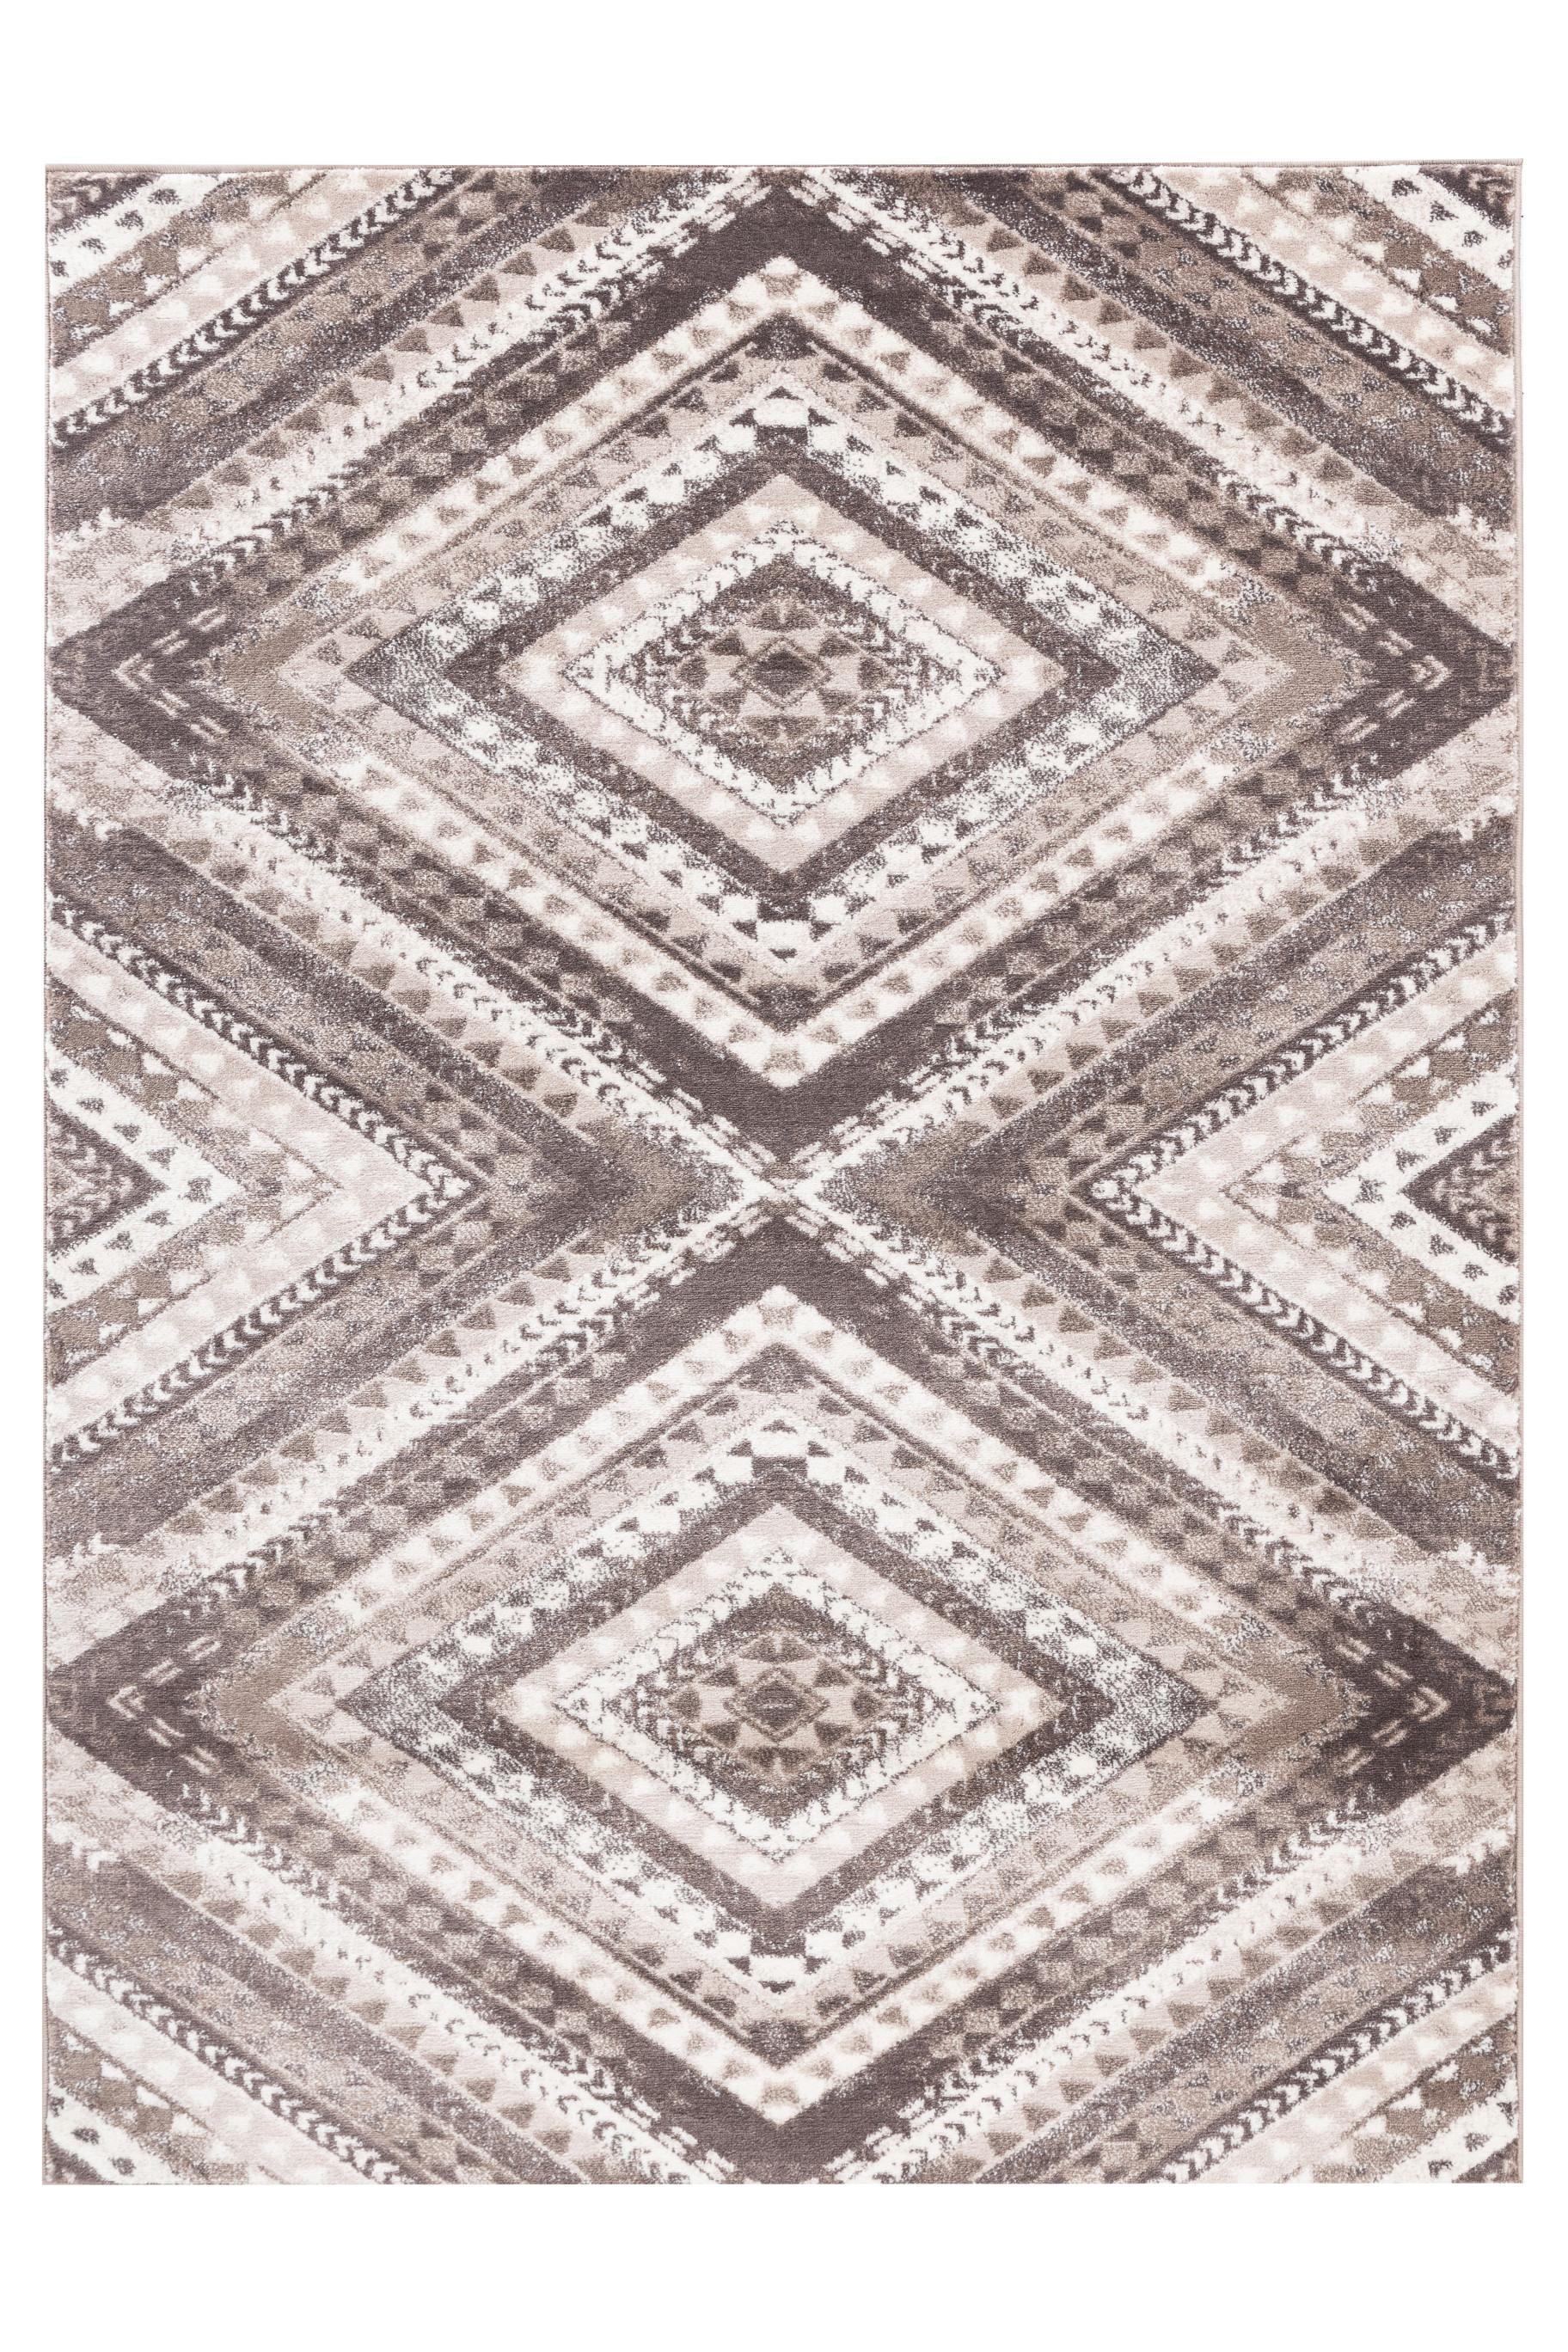 Rite Rug Carpet Reviews Carpet Vidalondon